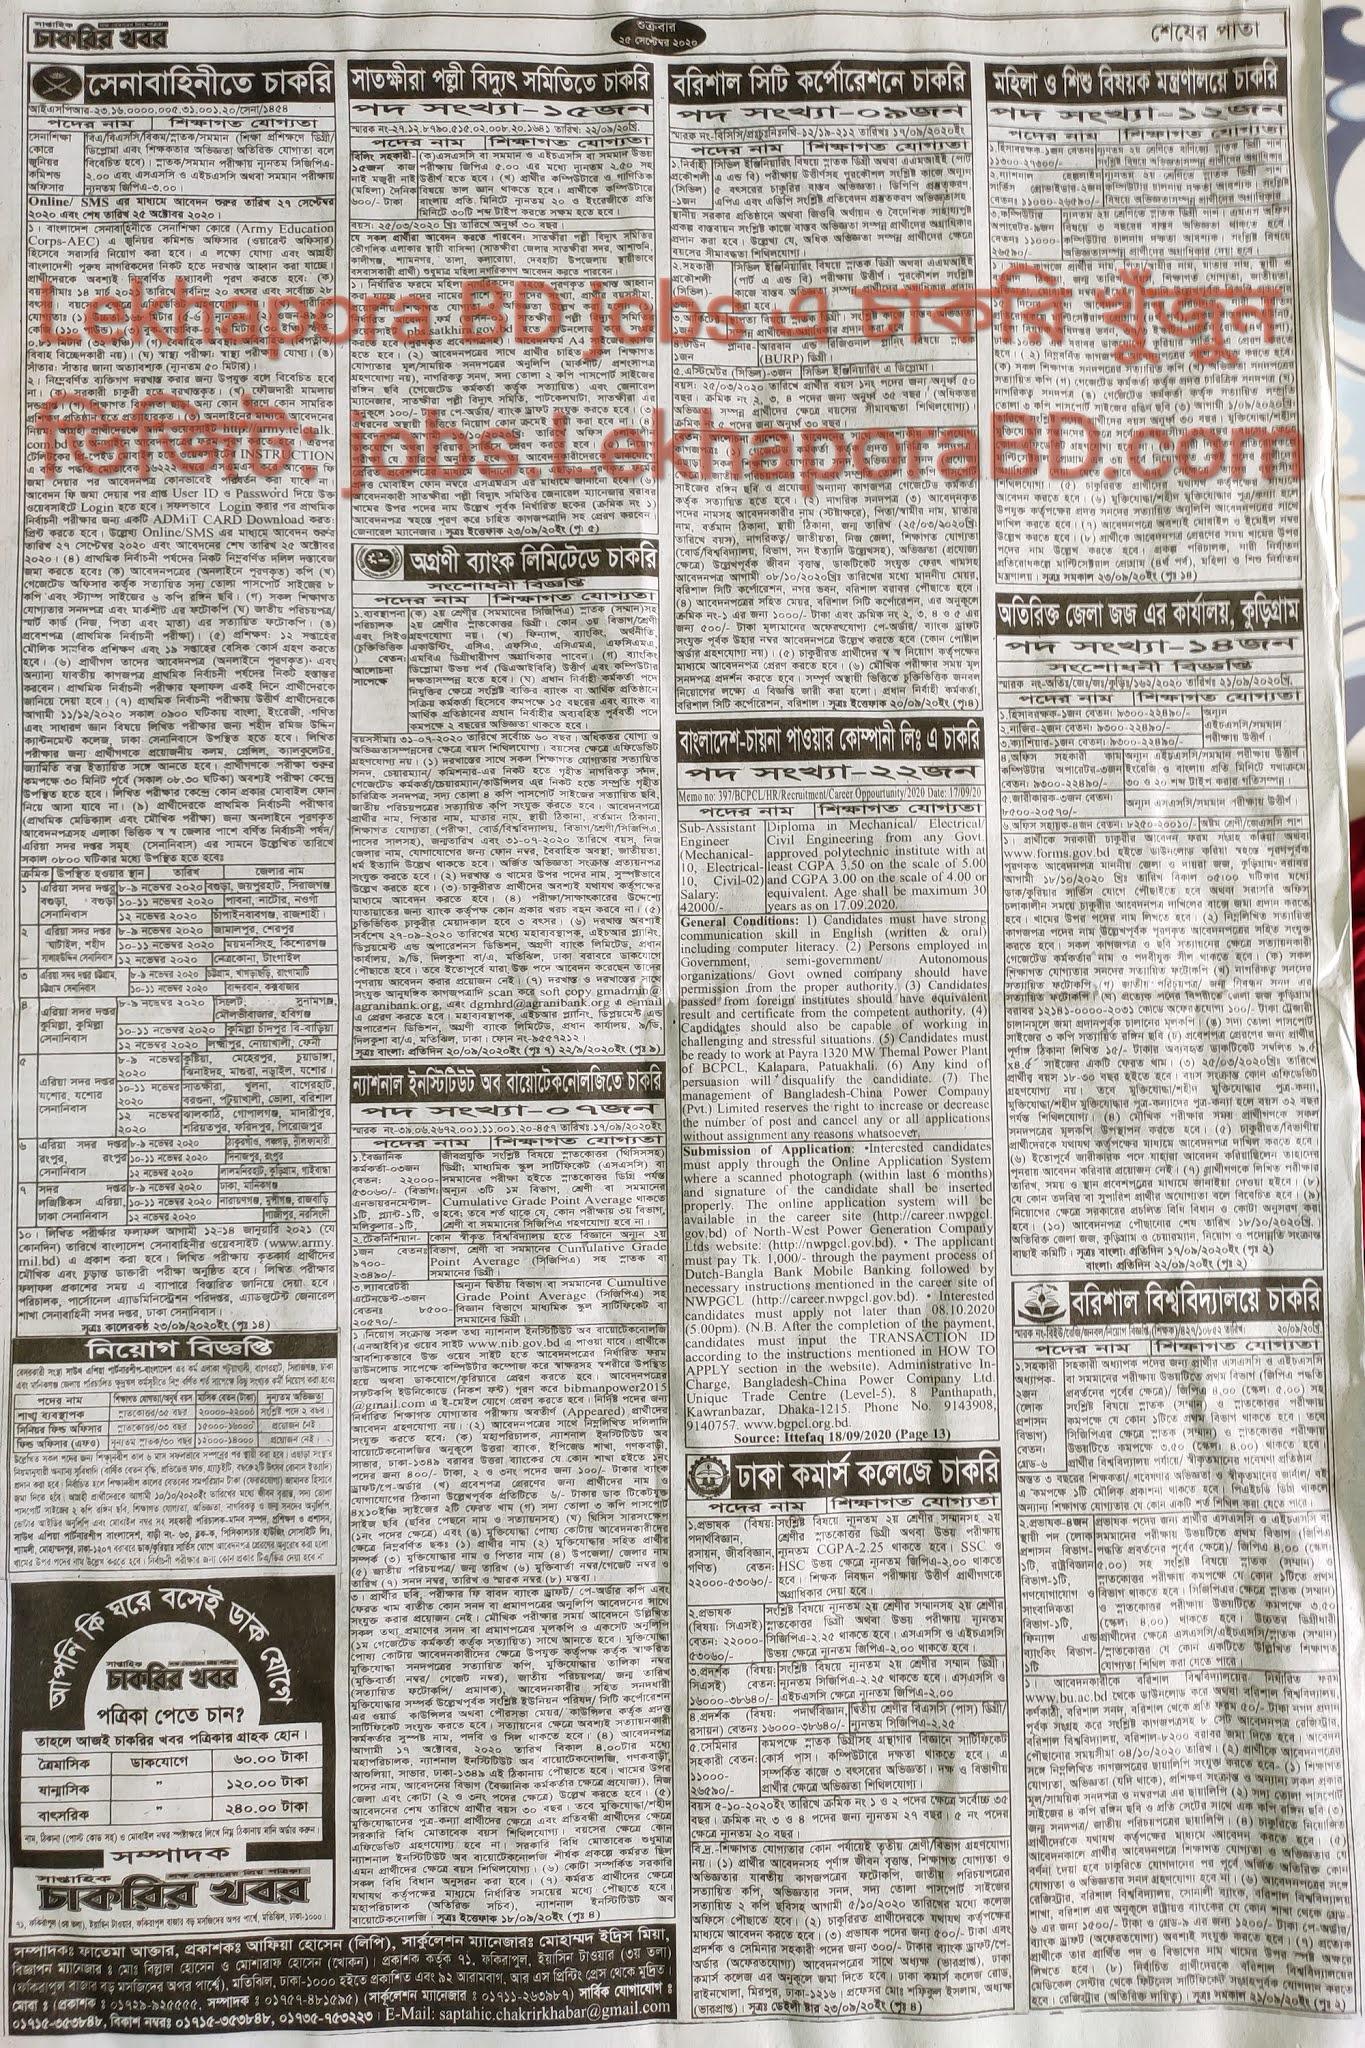 chakrir khobor potrika 25 september 2020 - Saptahik Chakrir Khobor Newspaper 25 September 2020 সাপ্তাহিক চাকরির খবর পত্রিকা pdf Download